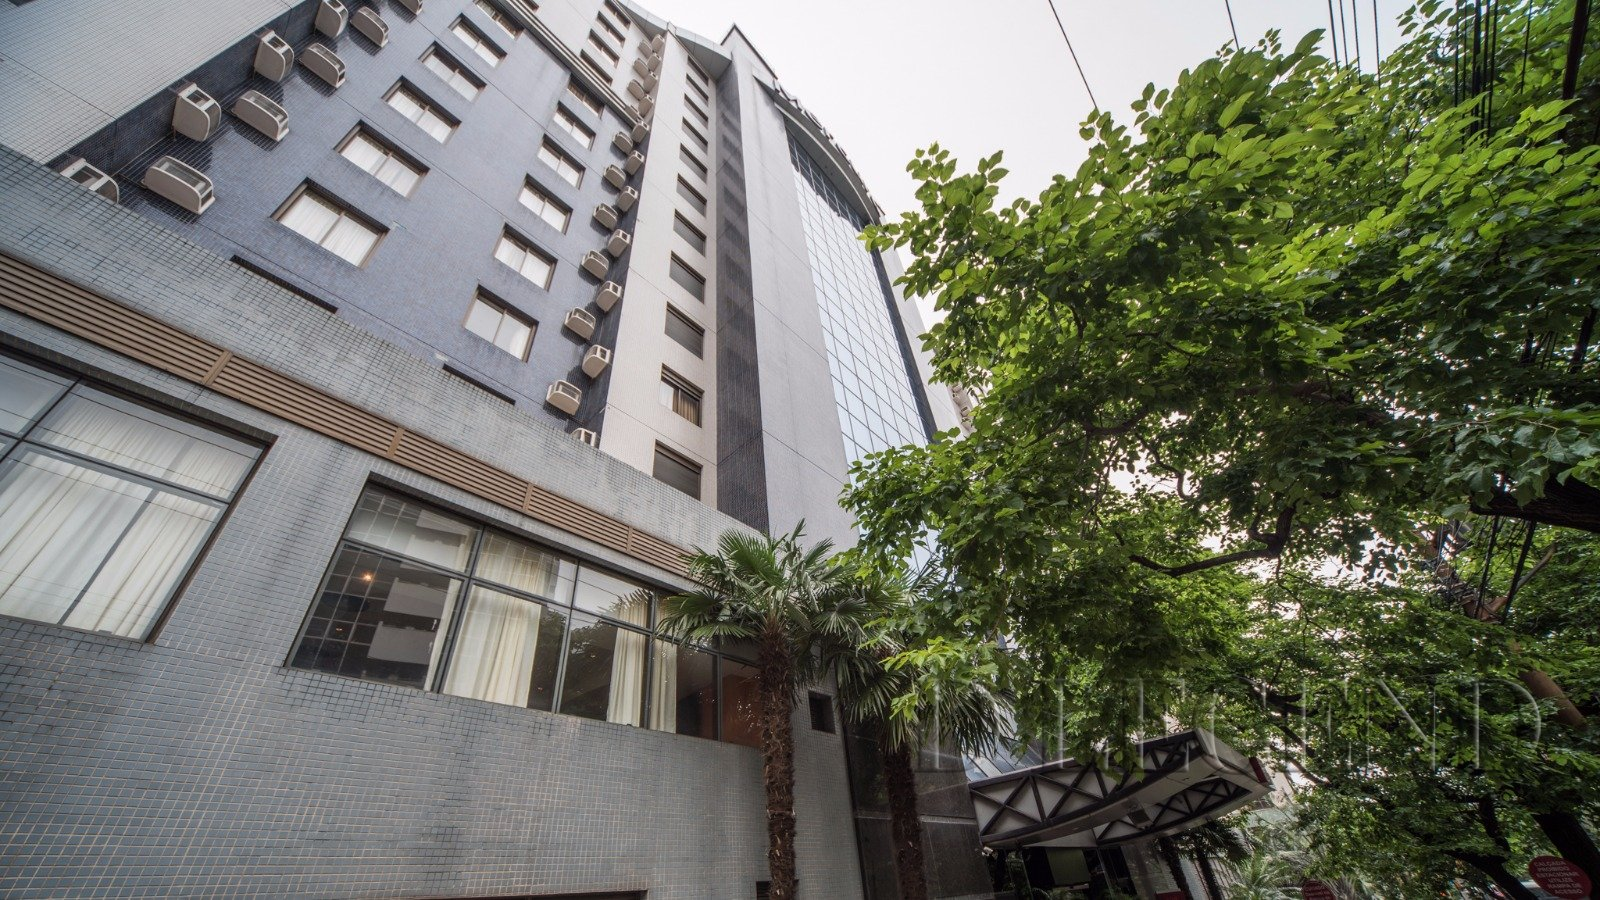 Manhattan Laghetto Flat - Rua Miguel Tostes, 30 - Moinhos de Vento - Porto Alegre